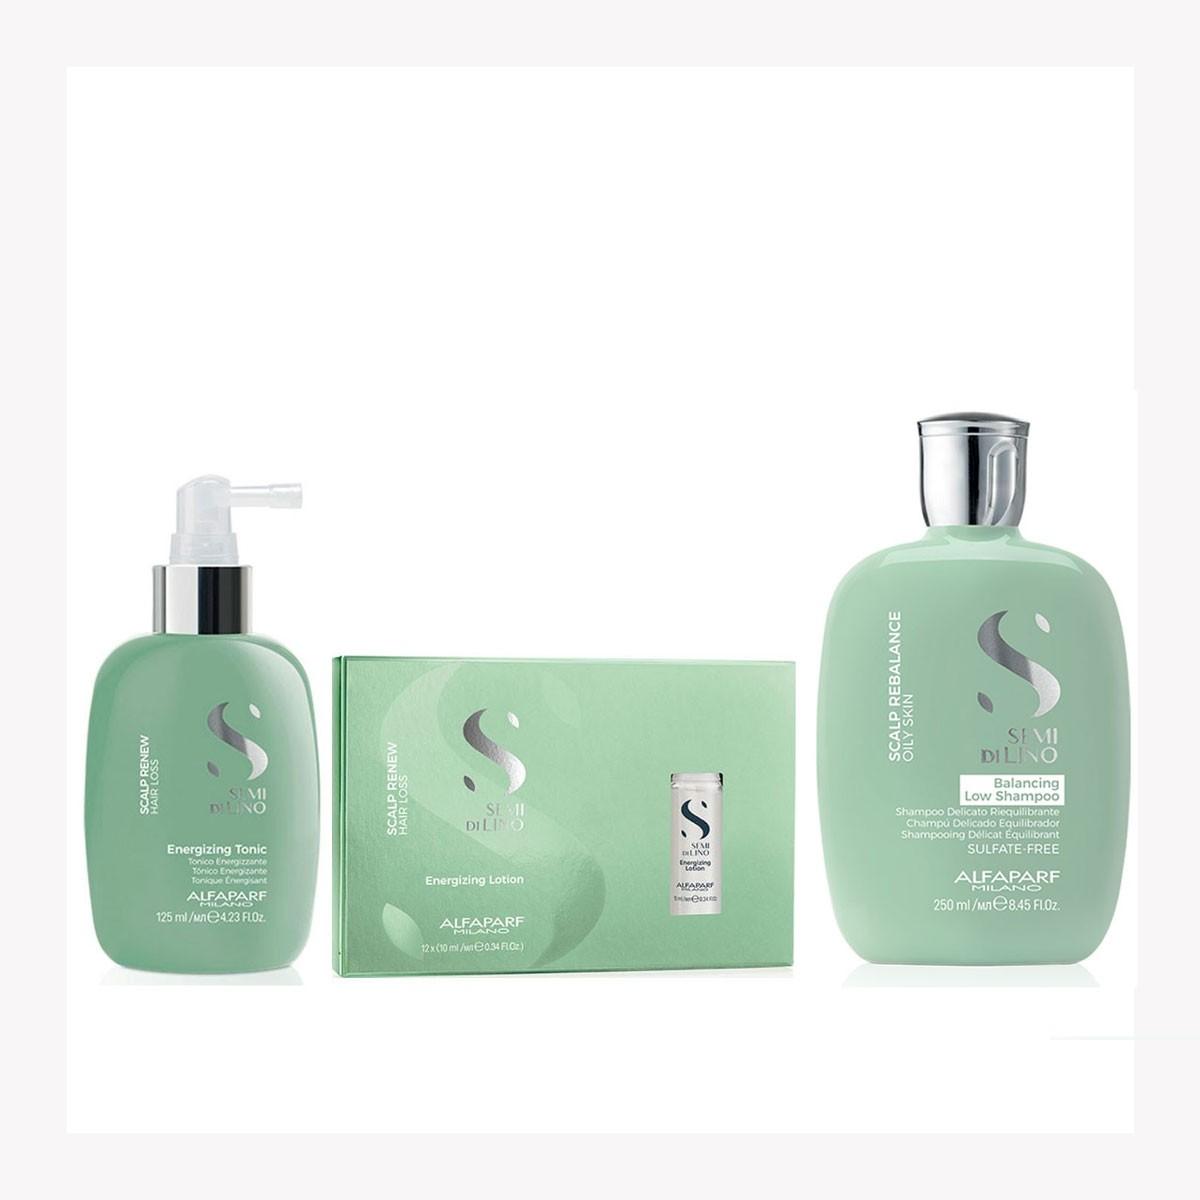 Kit Completo Anticaída Shampoo – Tónico - Ampolletas Scalp Renew Energizing Lotion Semi Di Lino Alfaparf